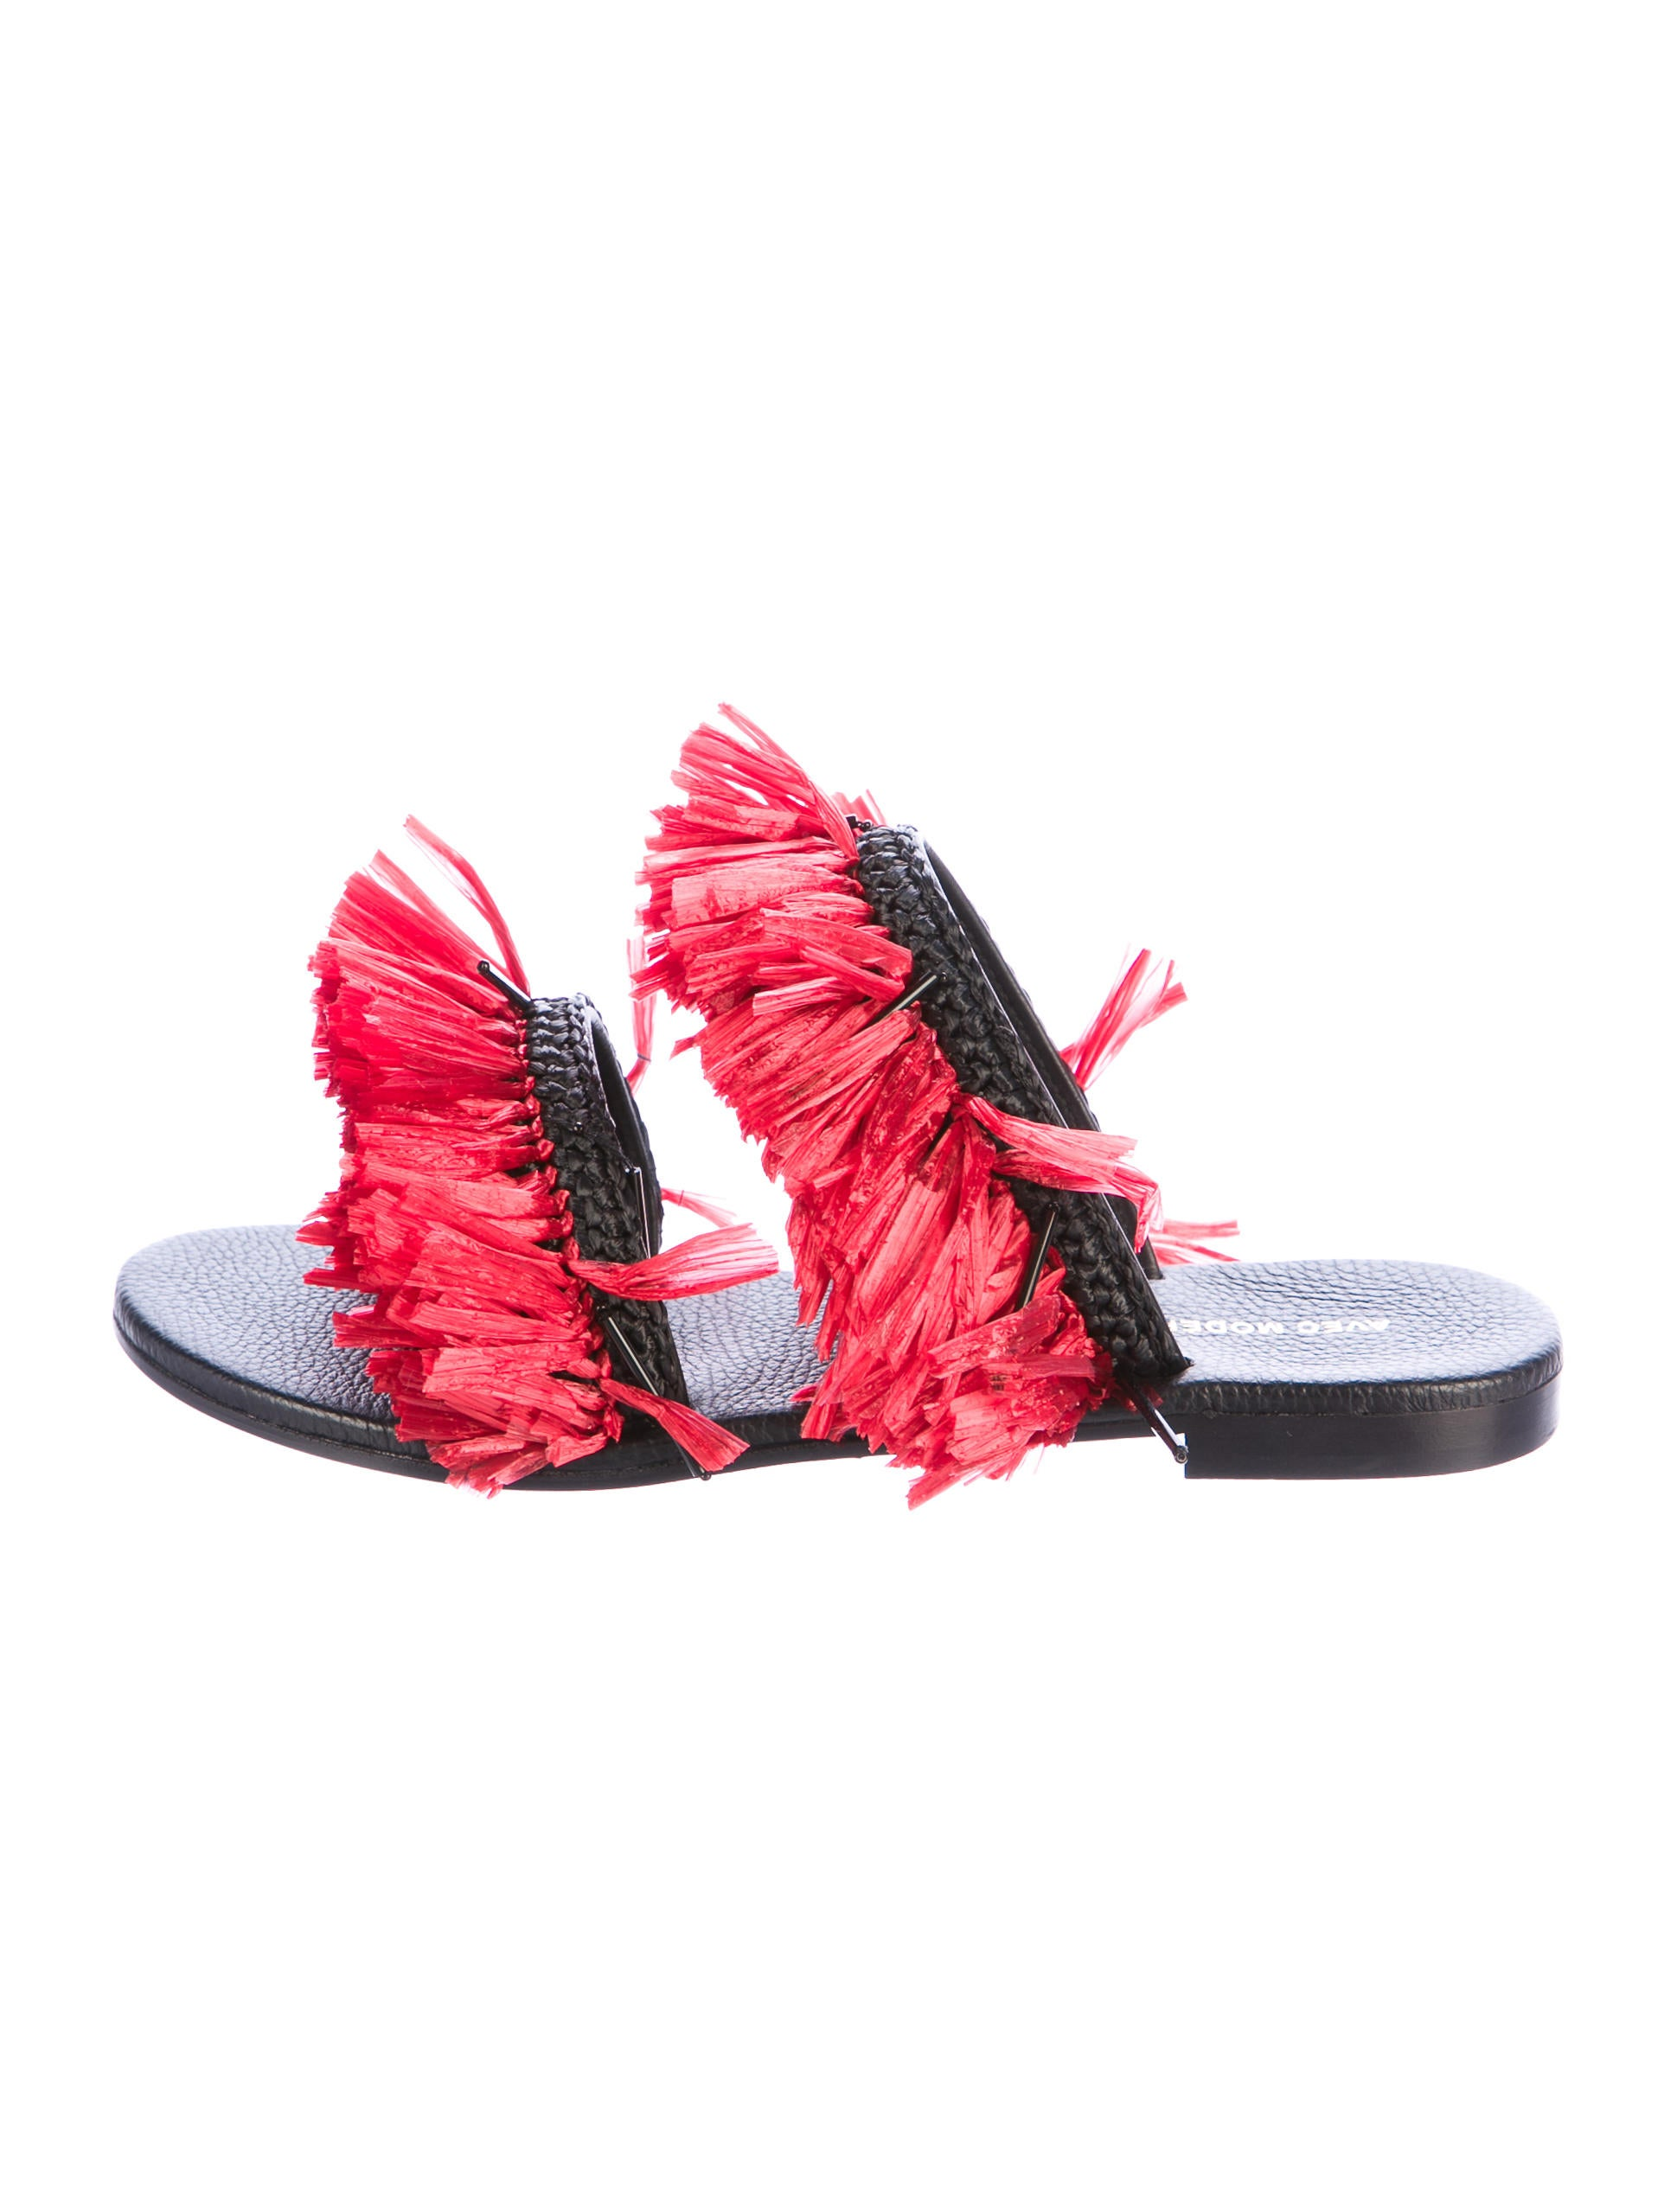 Avec Modération Ibiza Slide Sandals free shipping outlet store Orange 100% Original quality original discount shop for dCCljnrbT